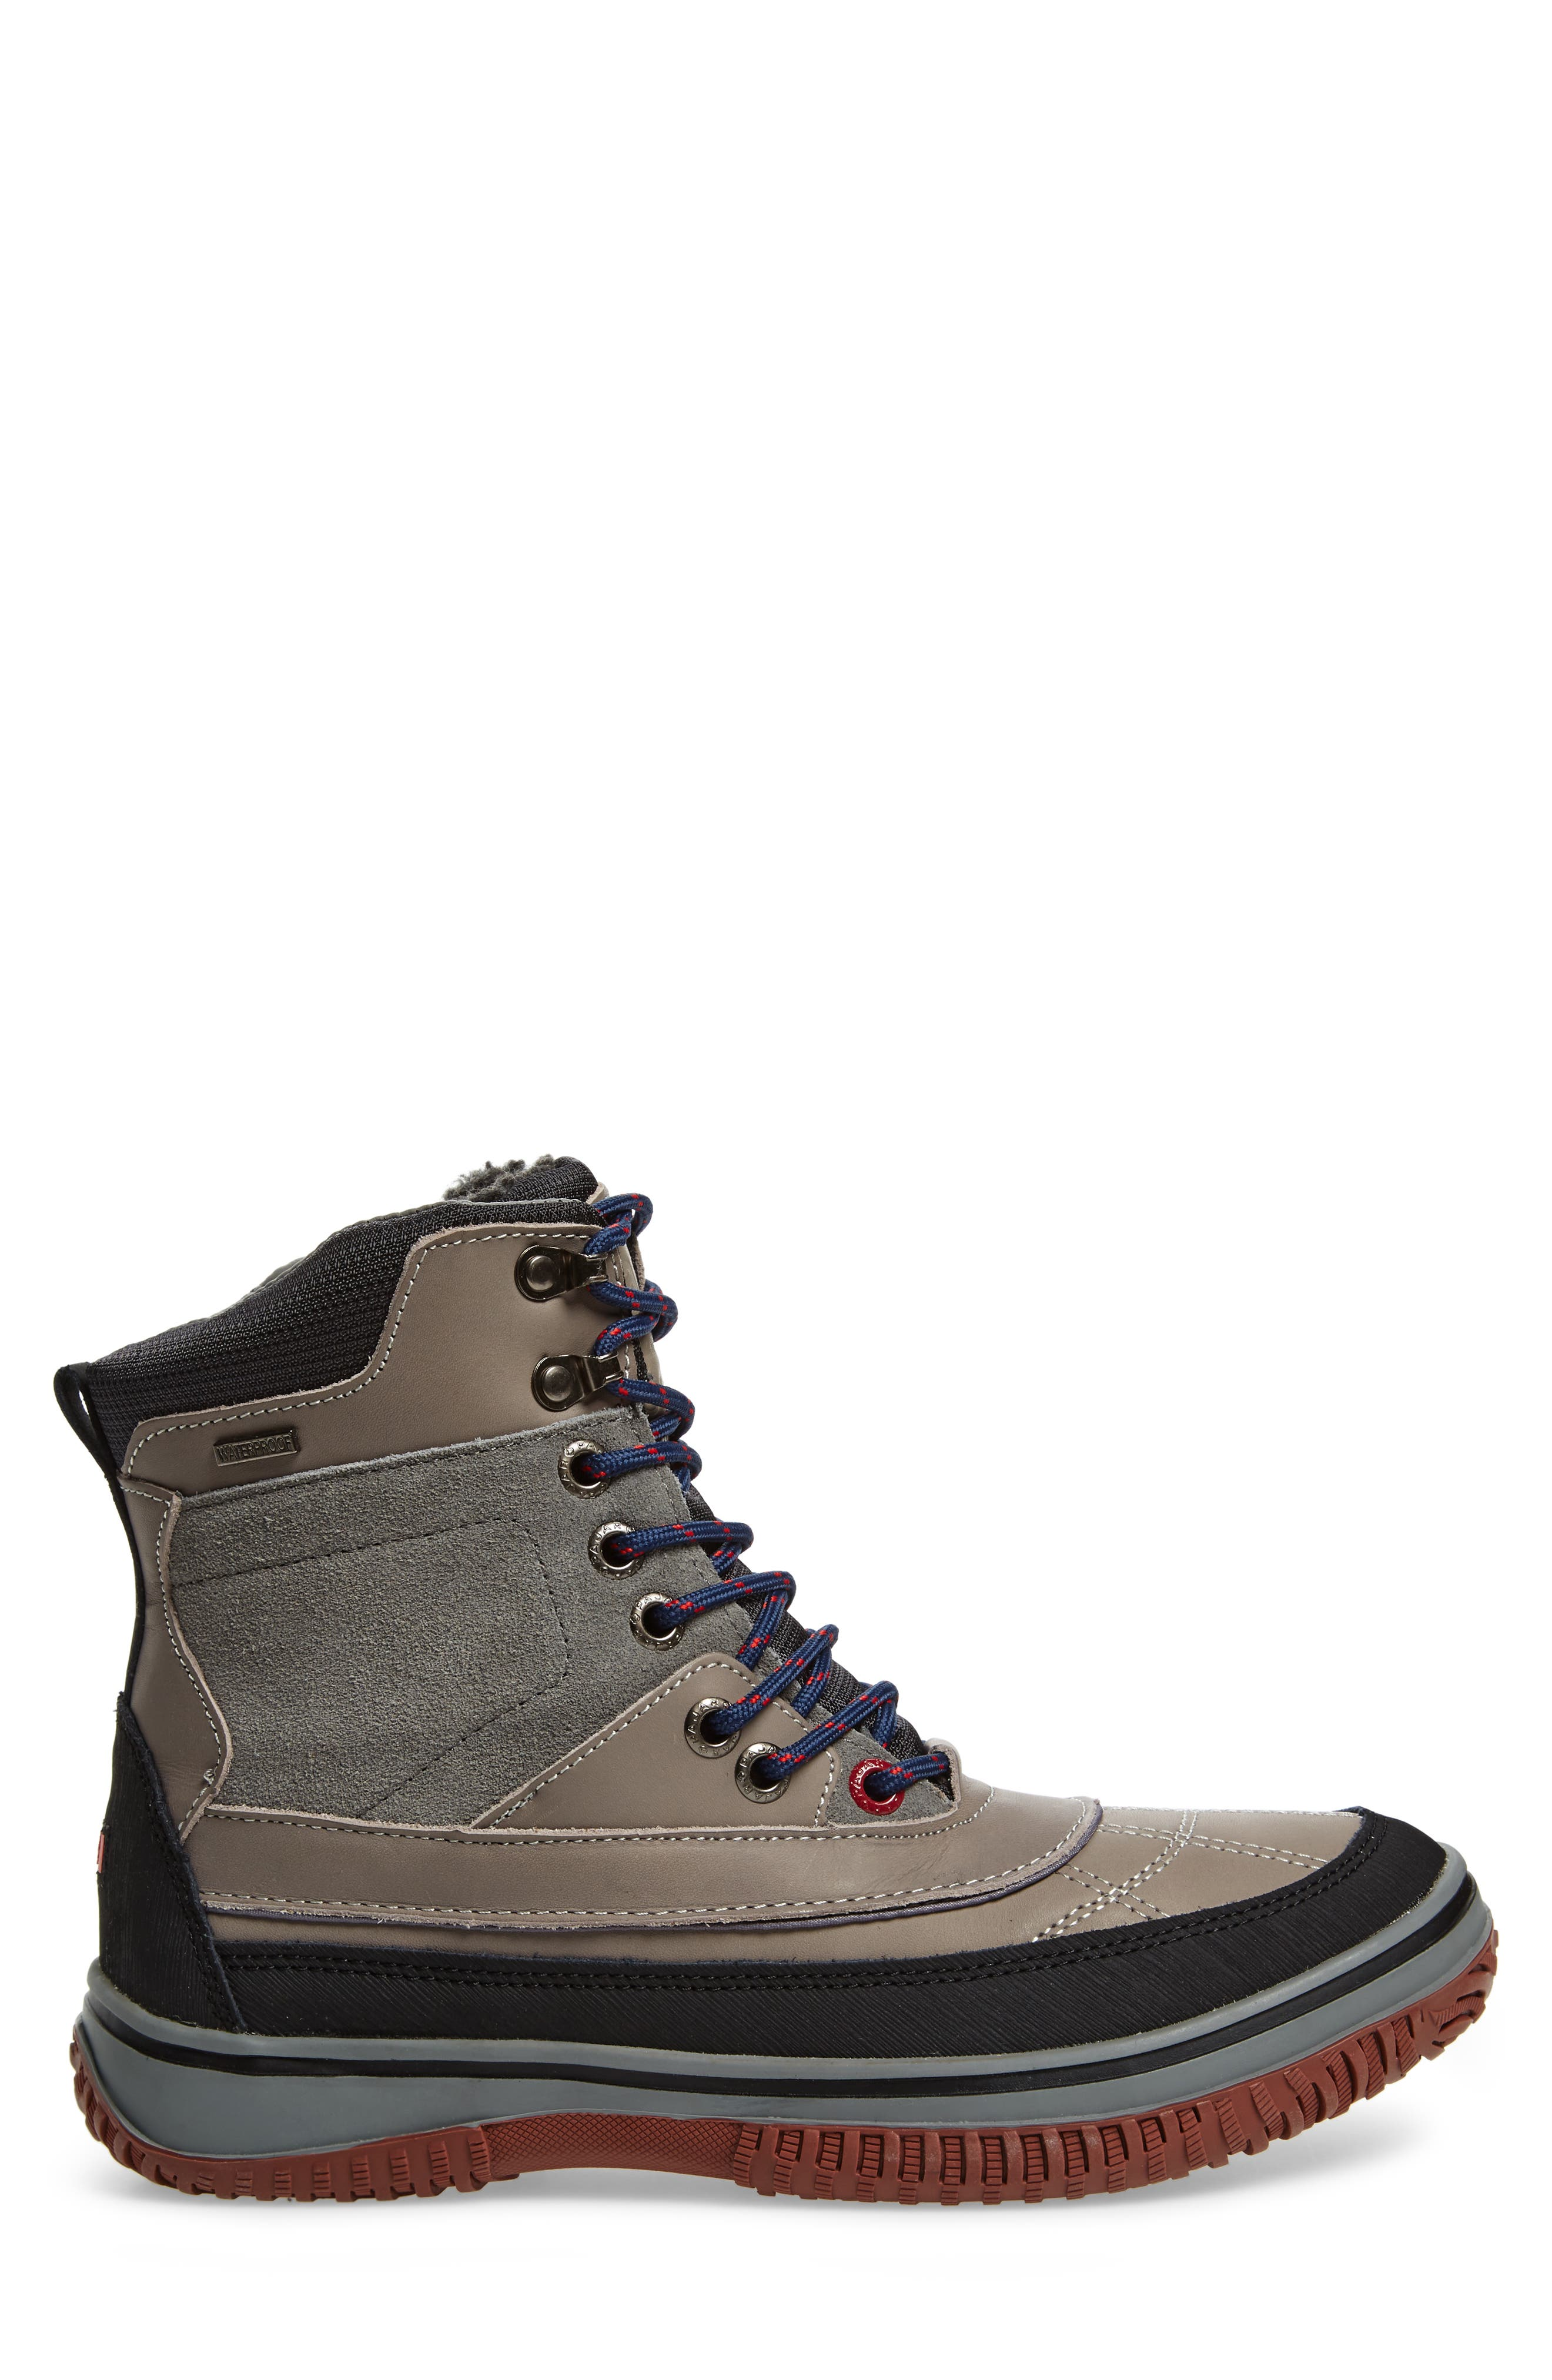 Gaspar Waterproof Winter Boot,                             Alternate thumbnail 3, color,                             Grey Leather